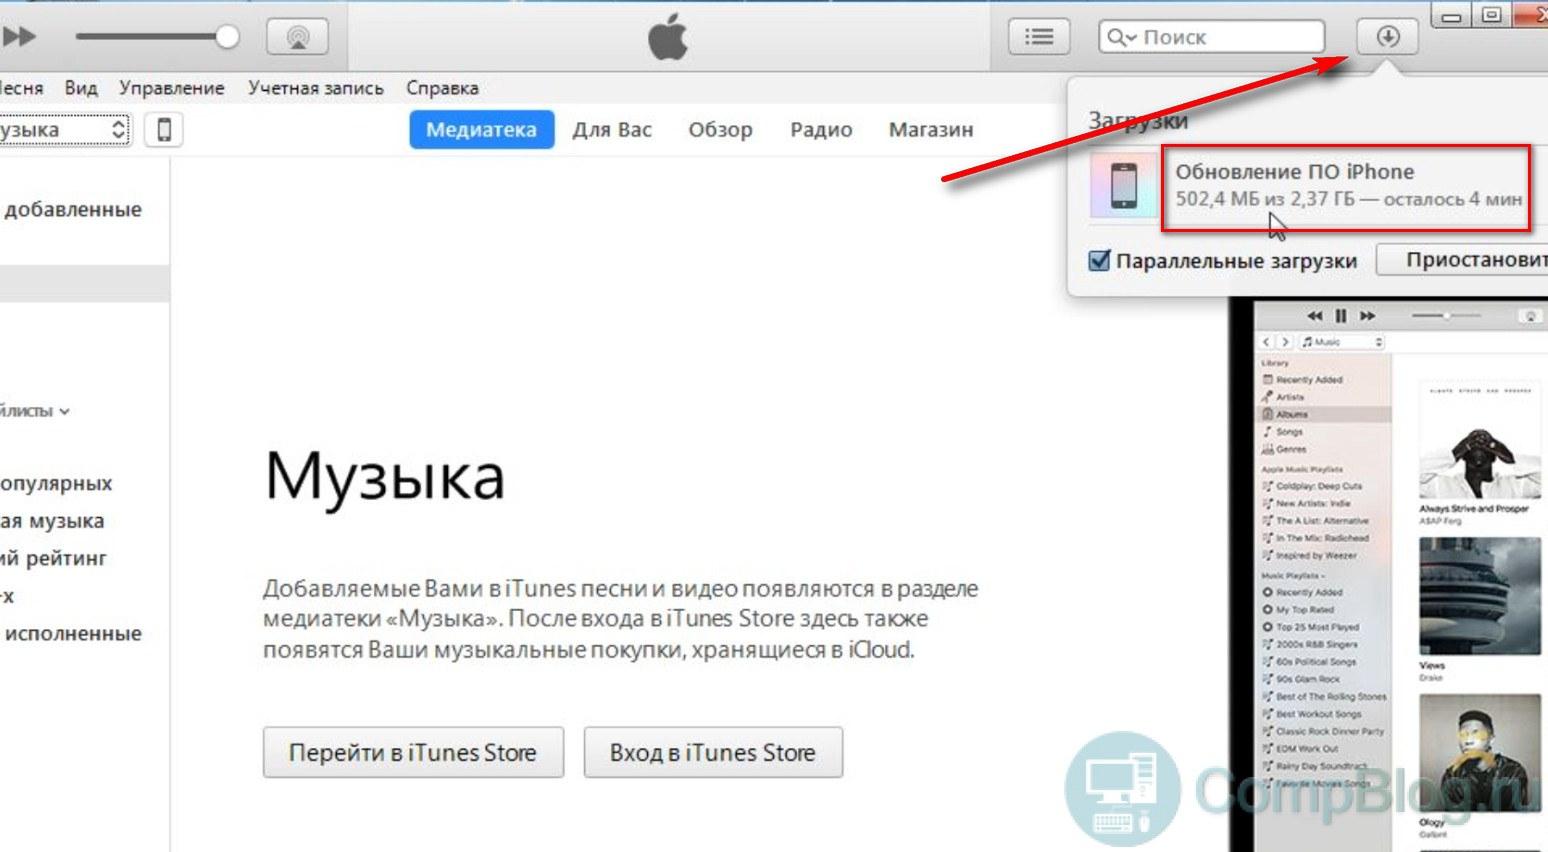 Инструкция по прошивке iphone 4